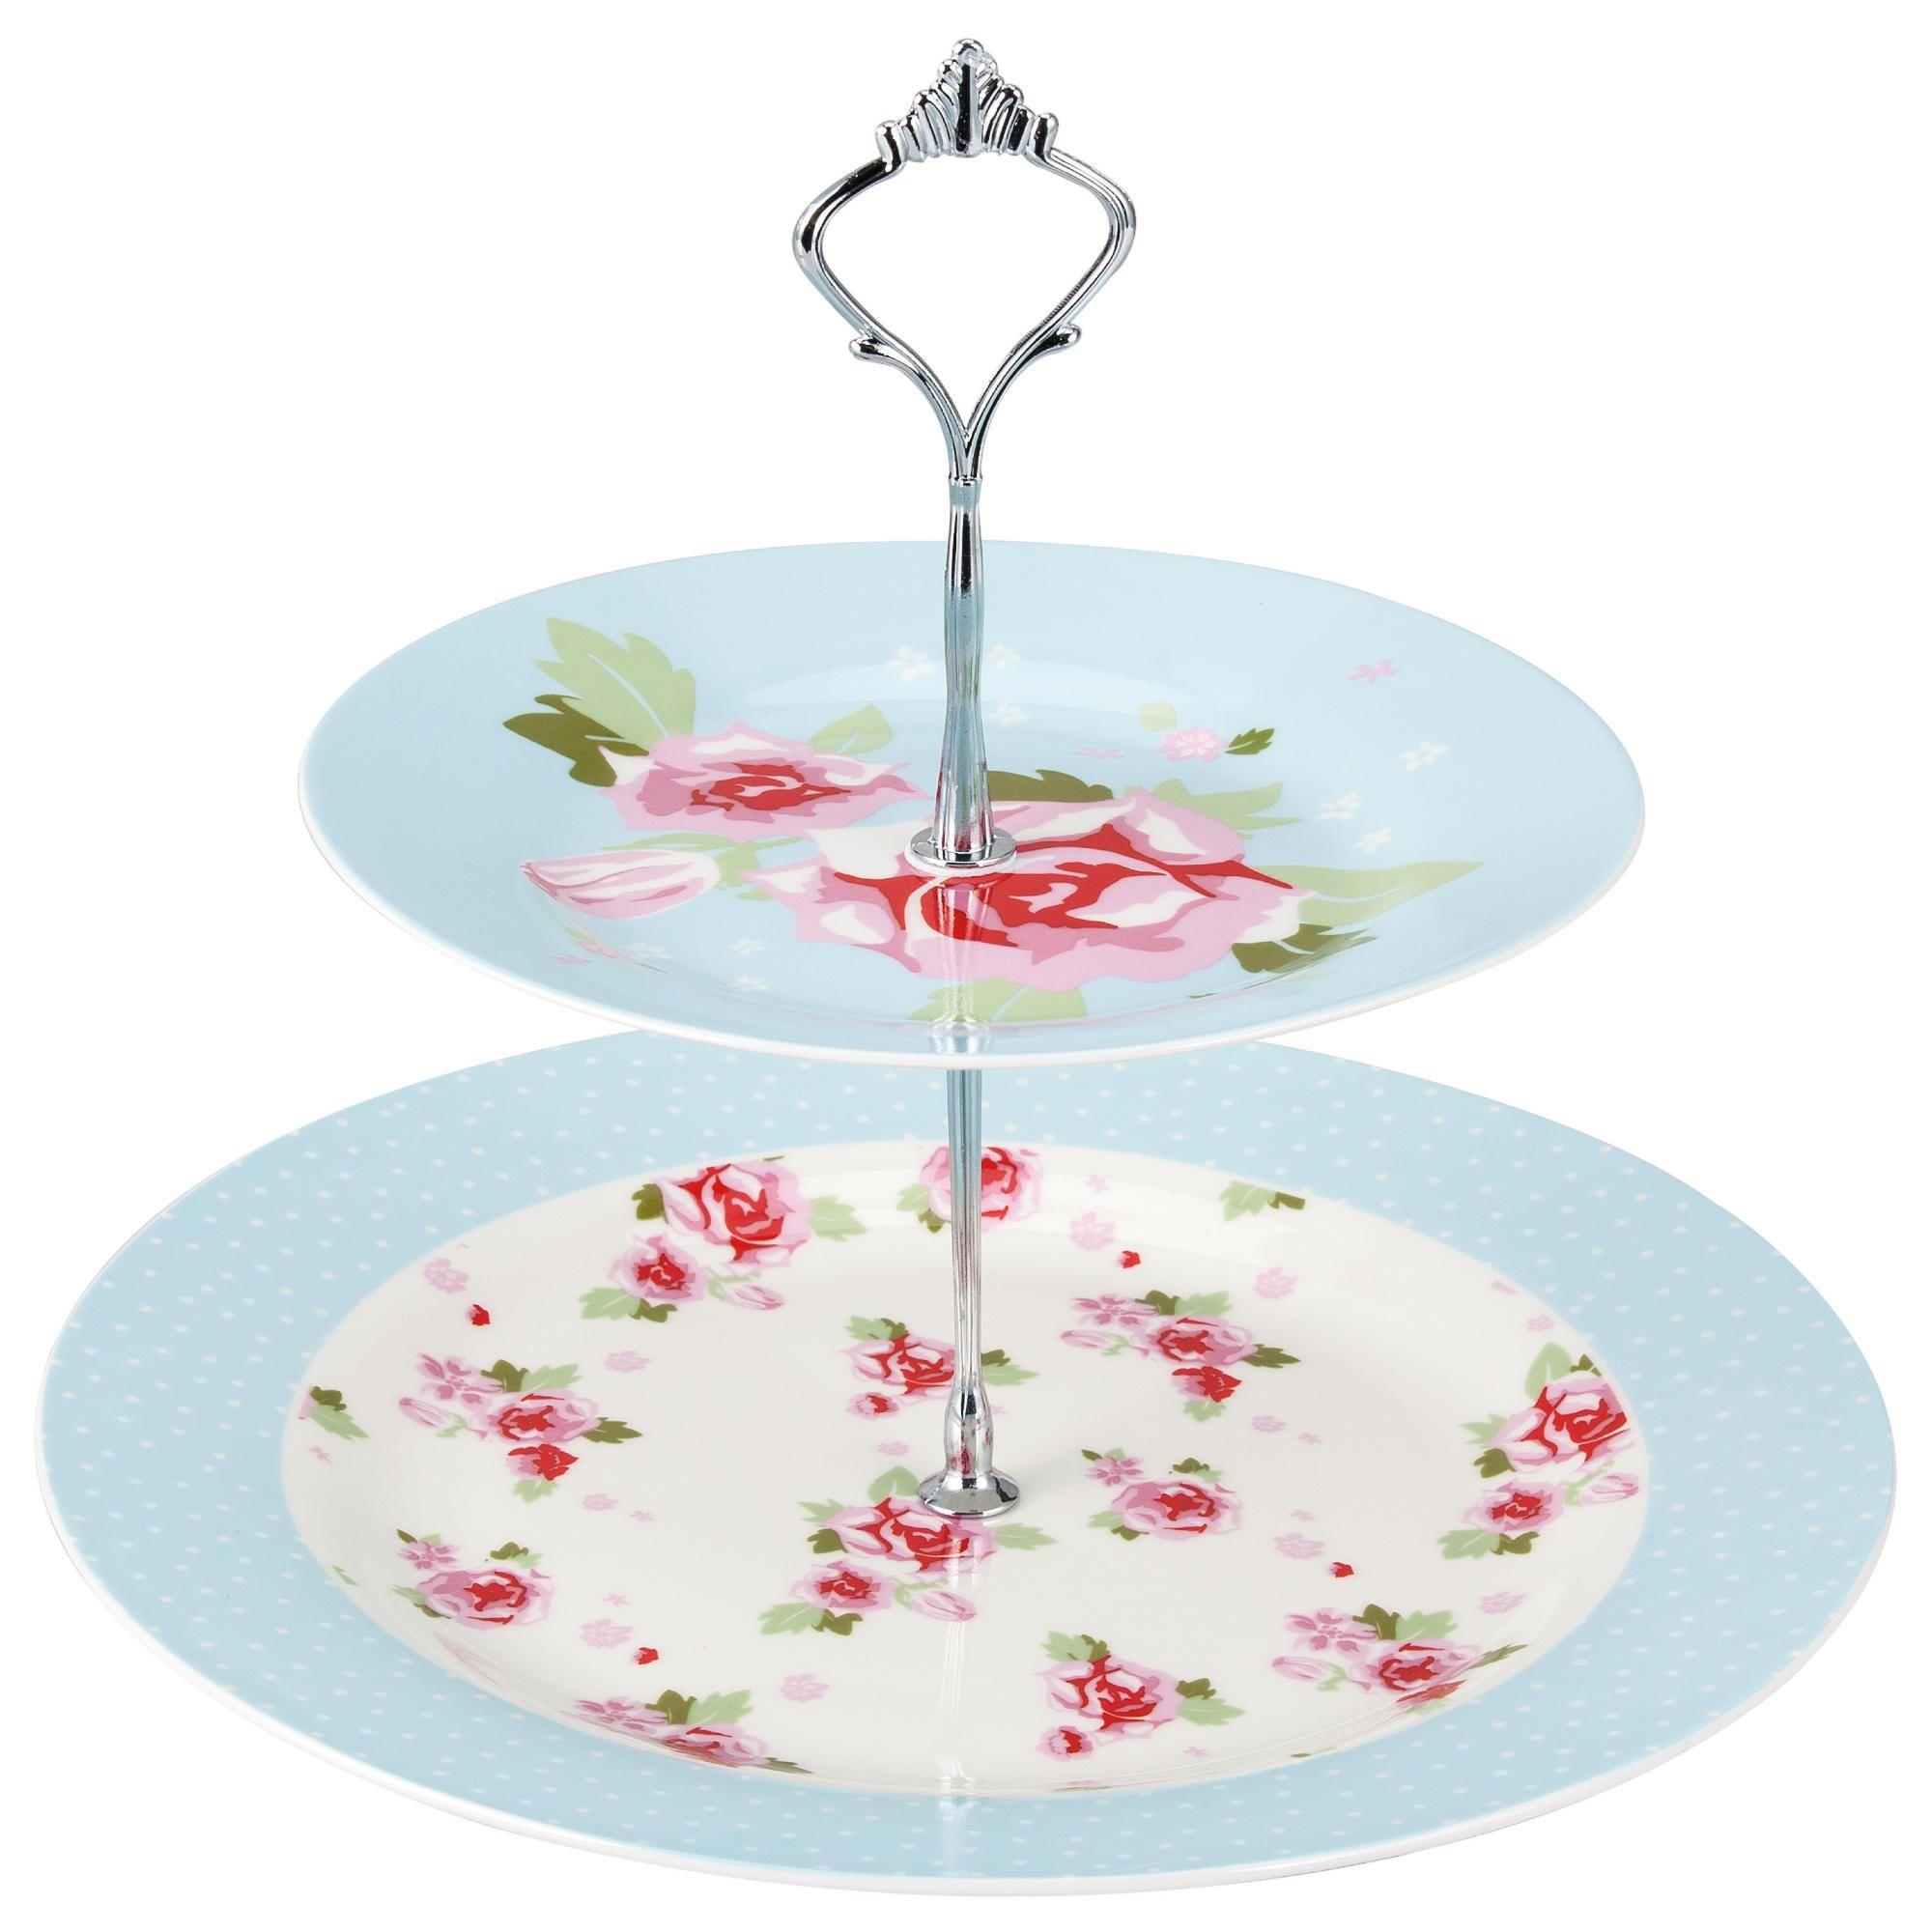 Tesco English Rose Fine China Cake Stand